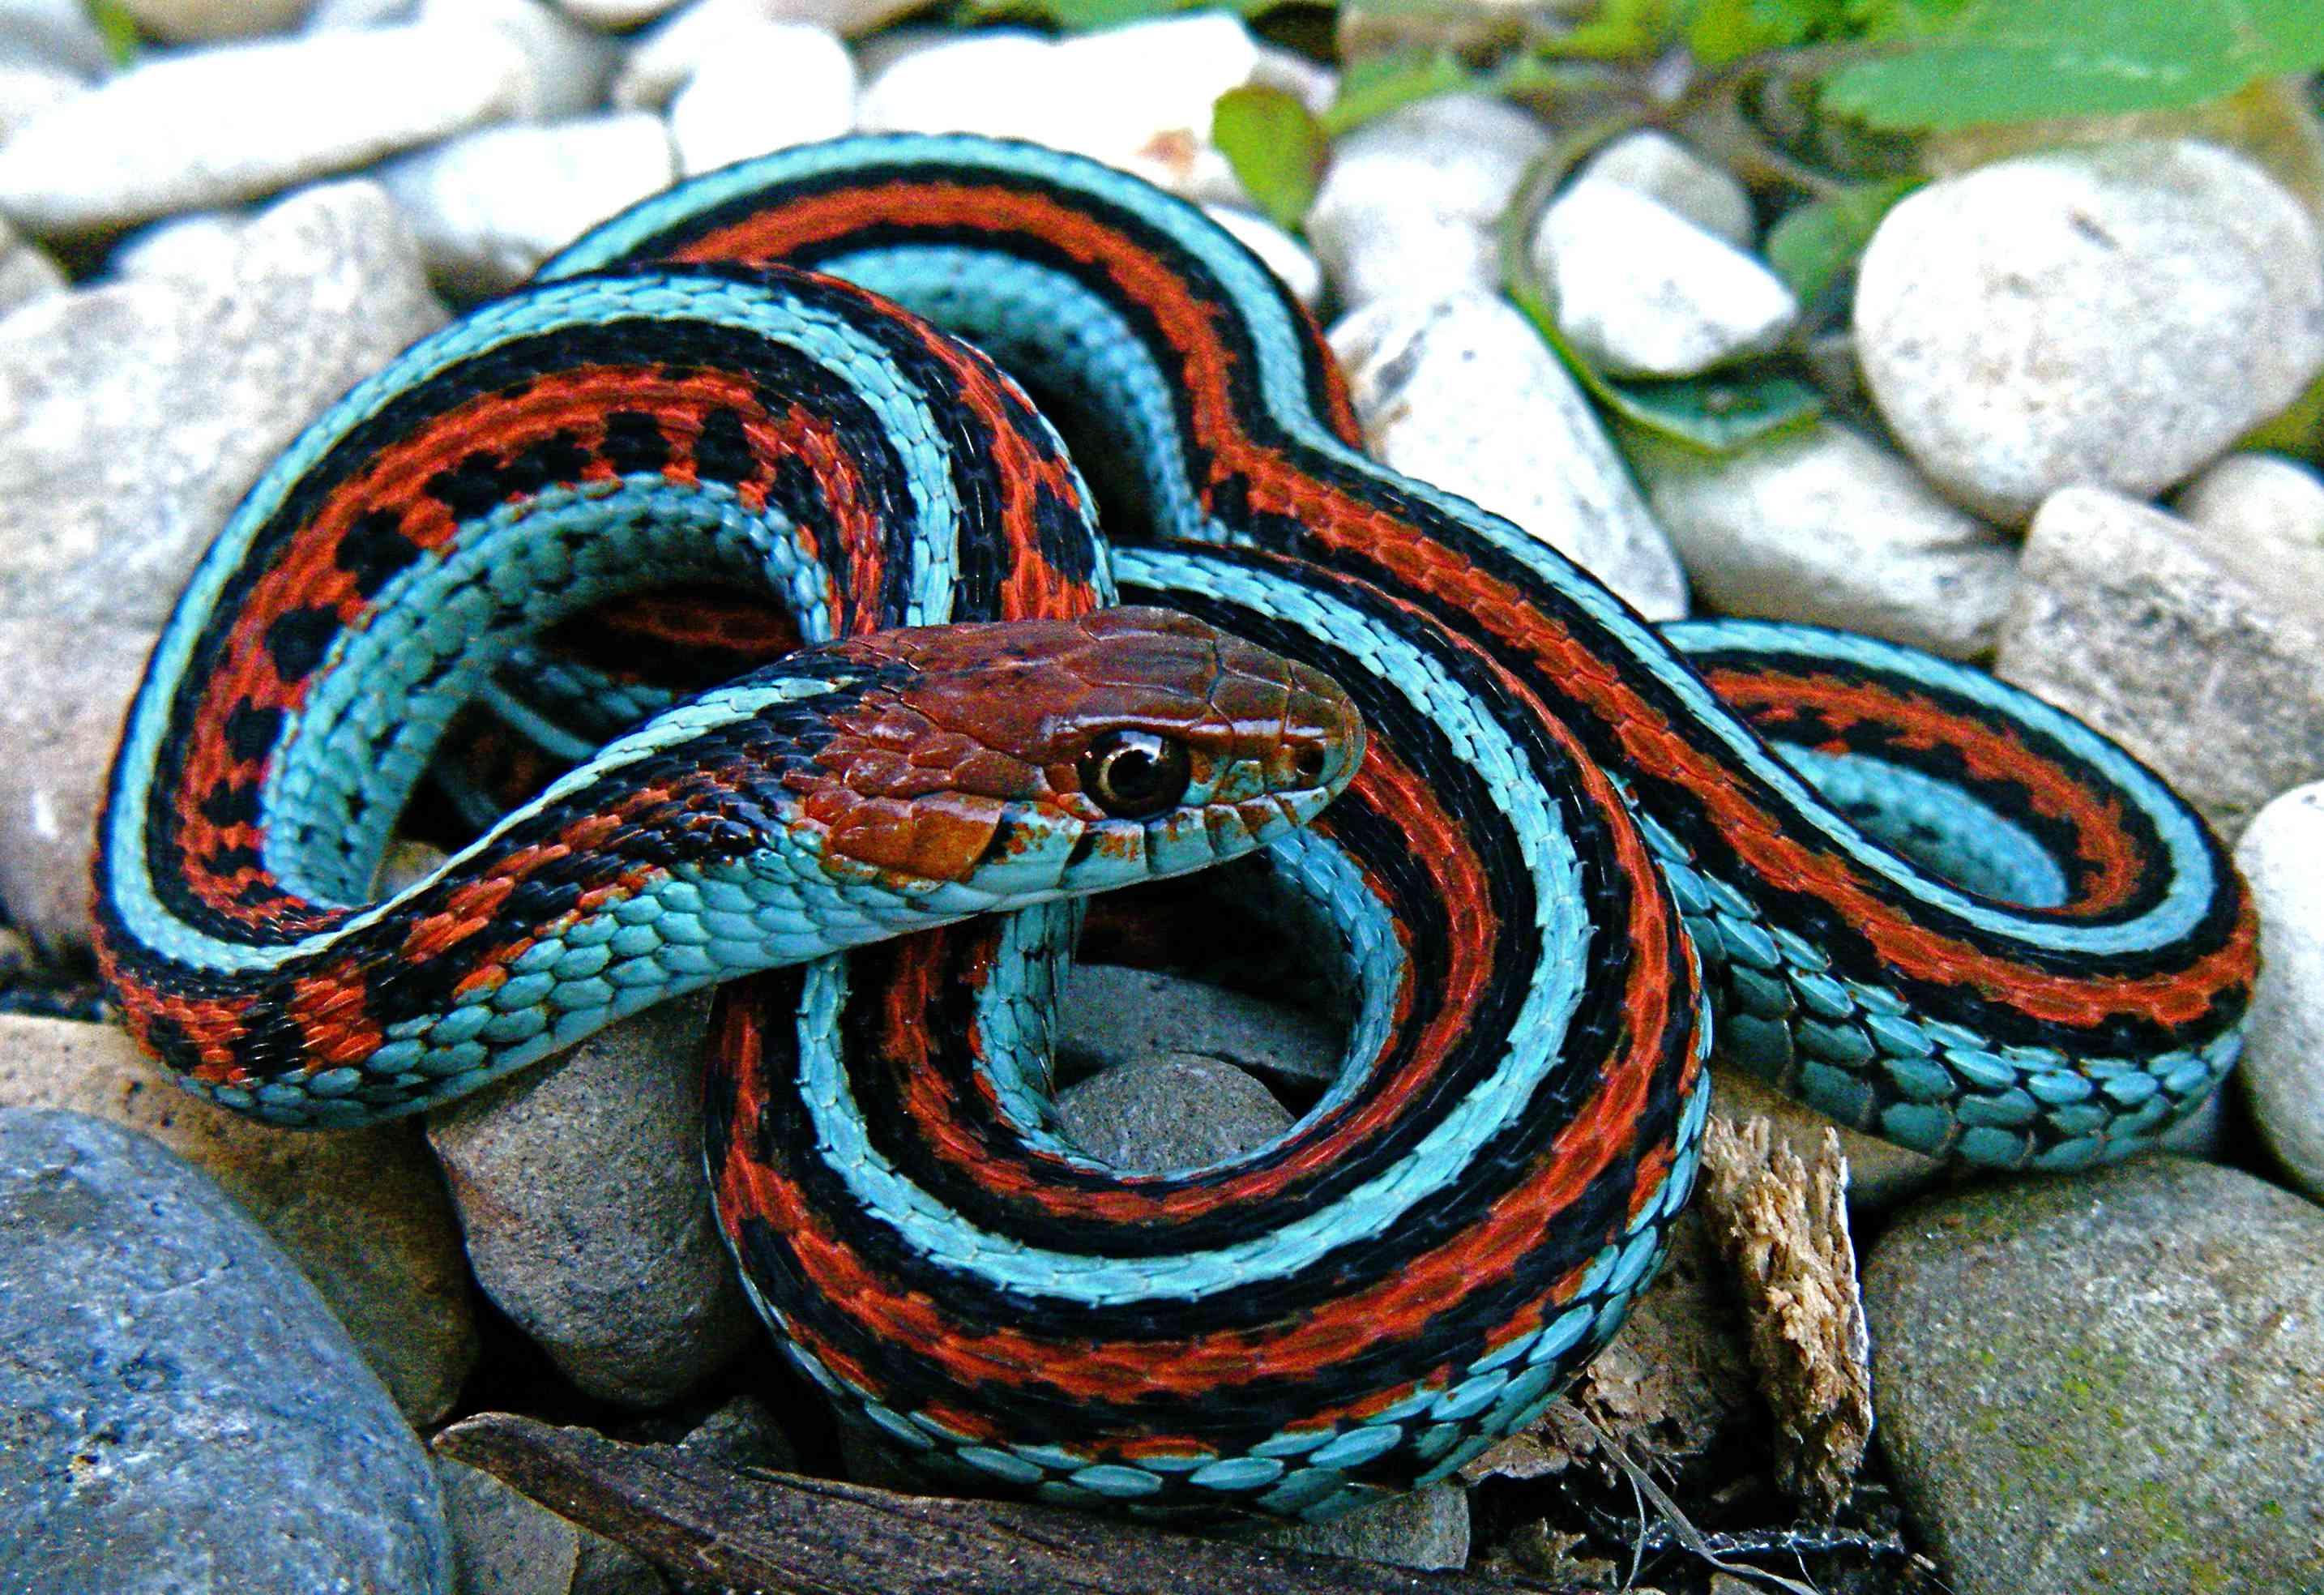 San Francisco garter snakes are listed as endangered